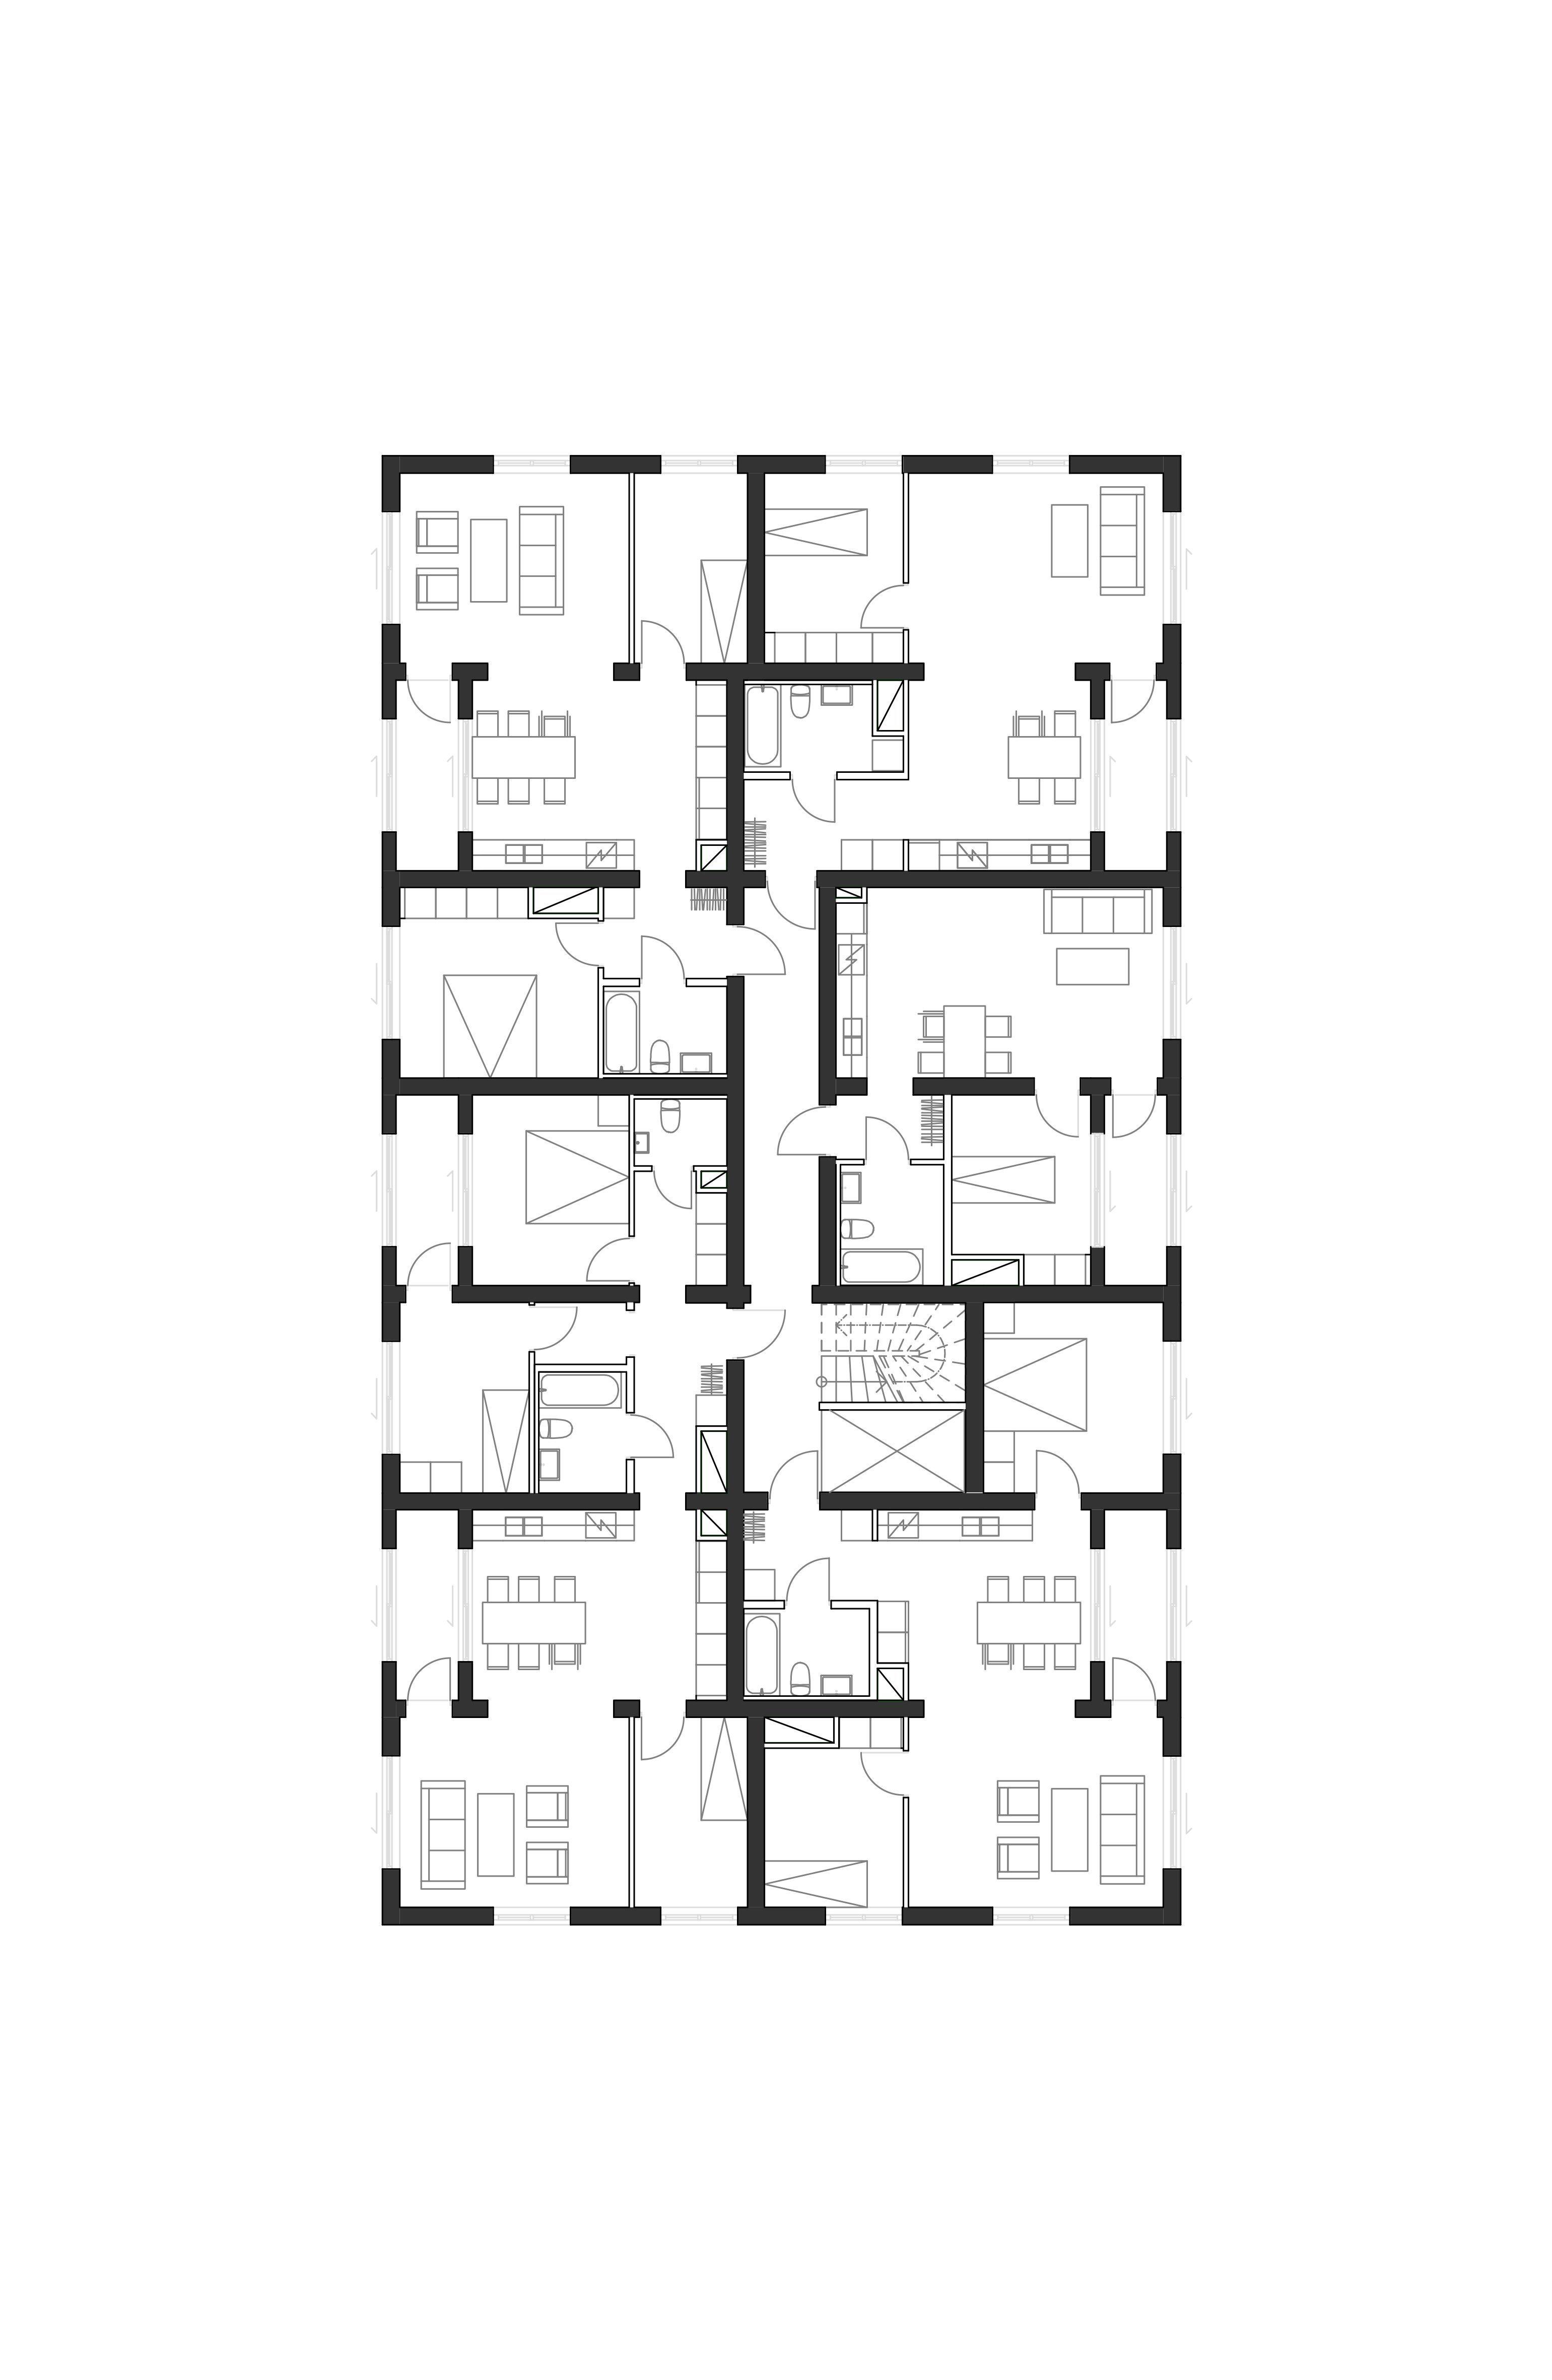 Imageimage Architectural Floor Plans Hospital Floor Plan Hospital Interior Design